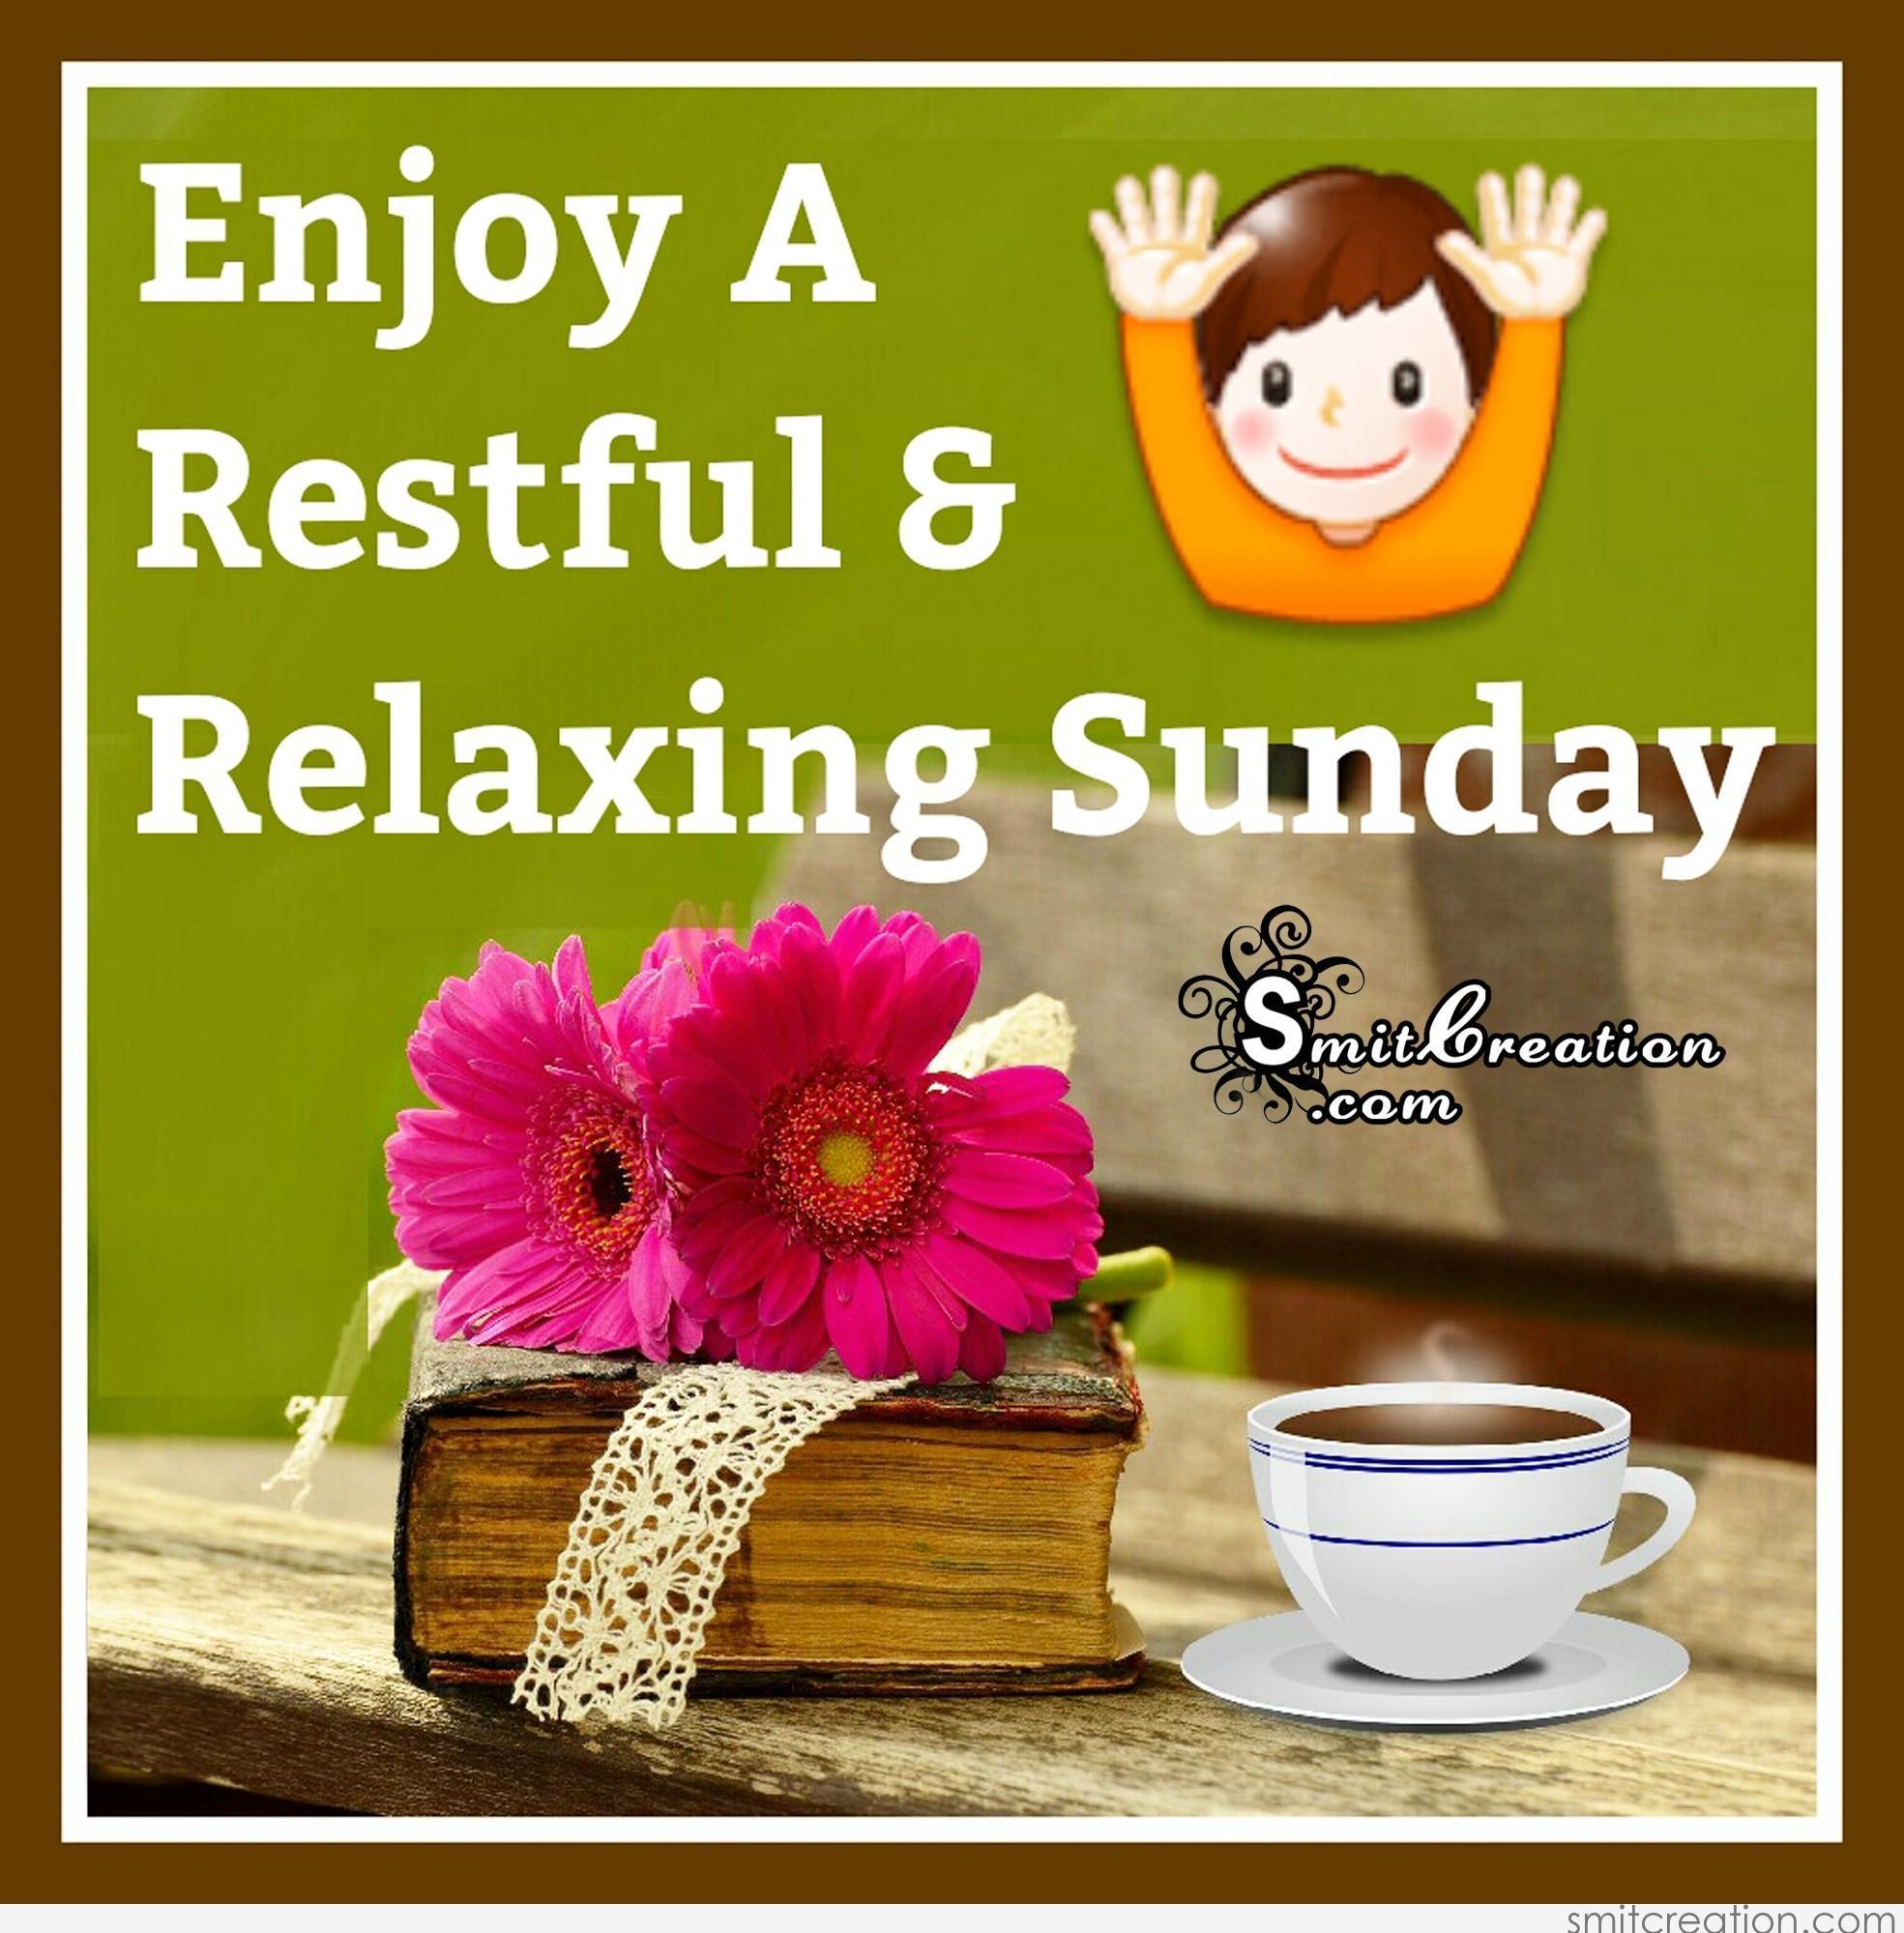 Enjoy A Restful & Relaxing Sunday - SmitCreation.com